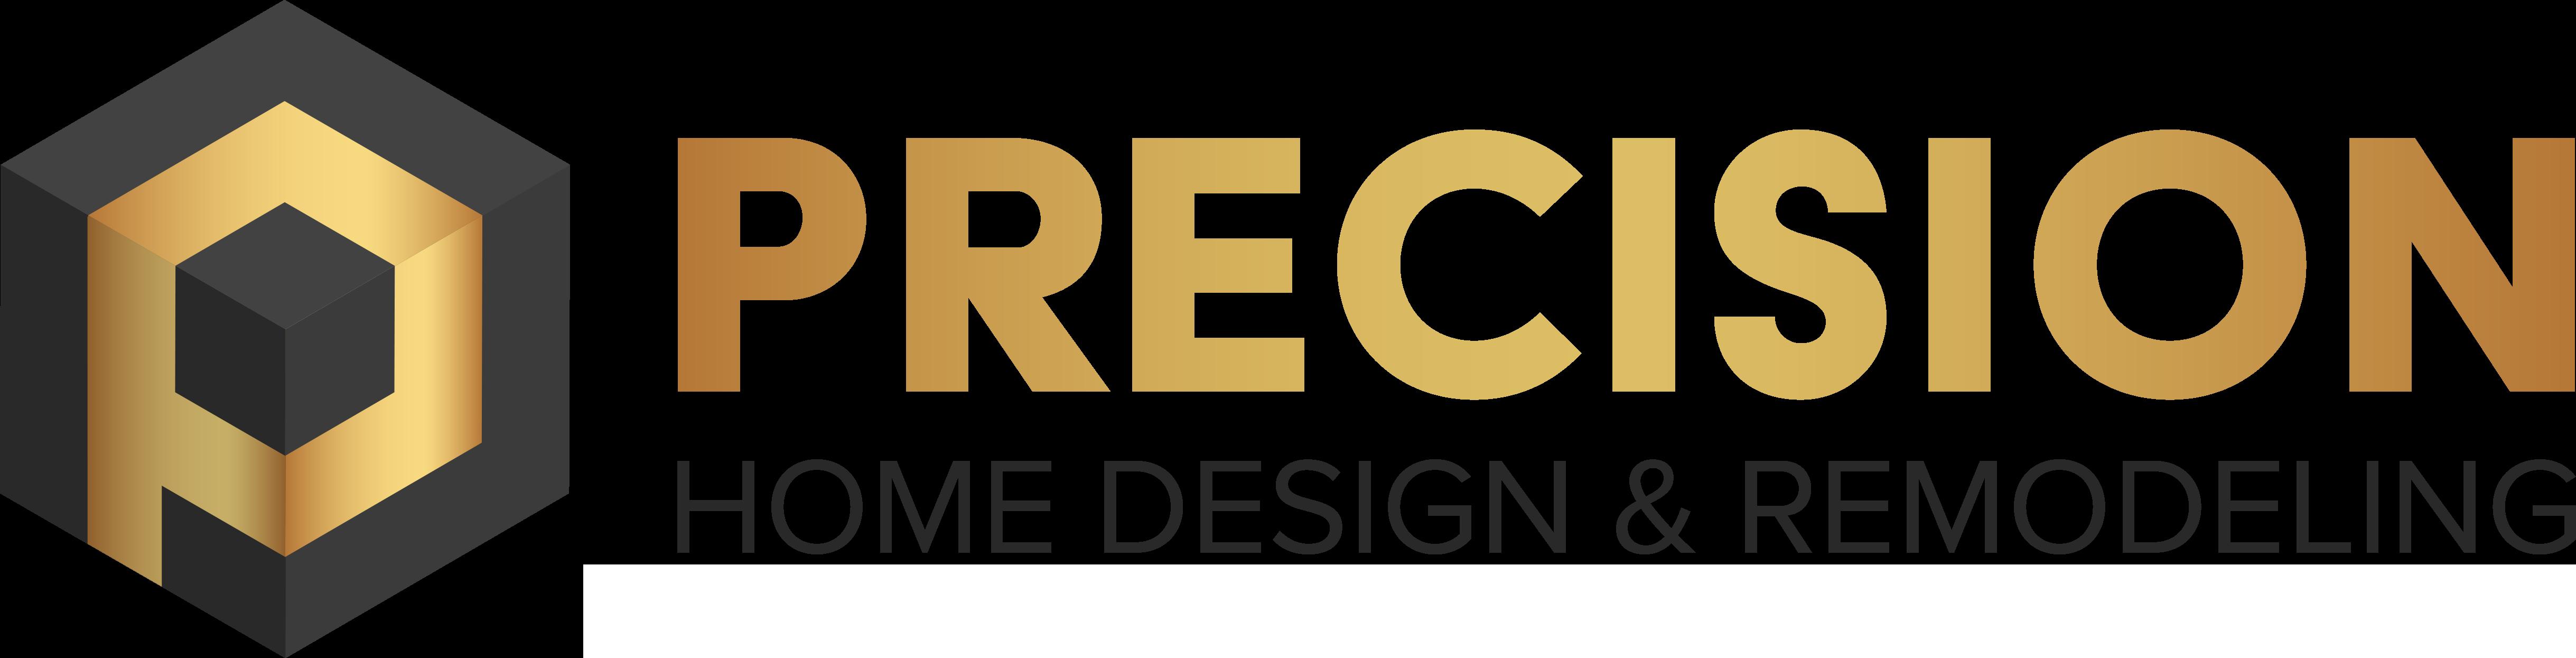 Precision Home Design & Remodeling